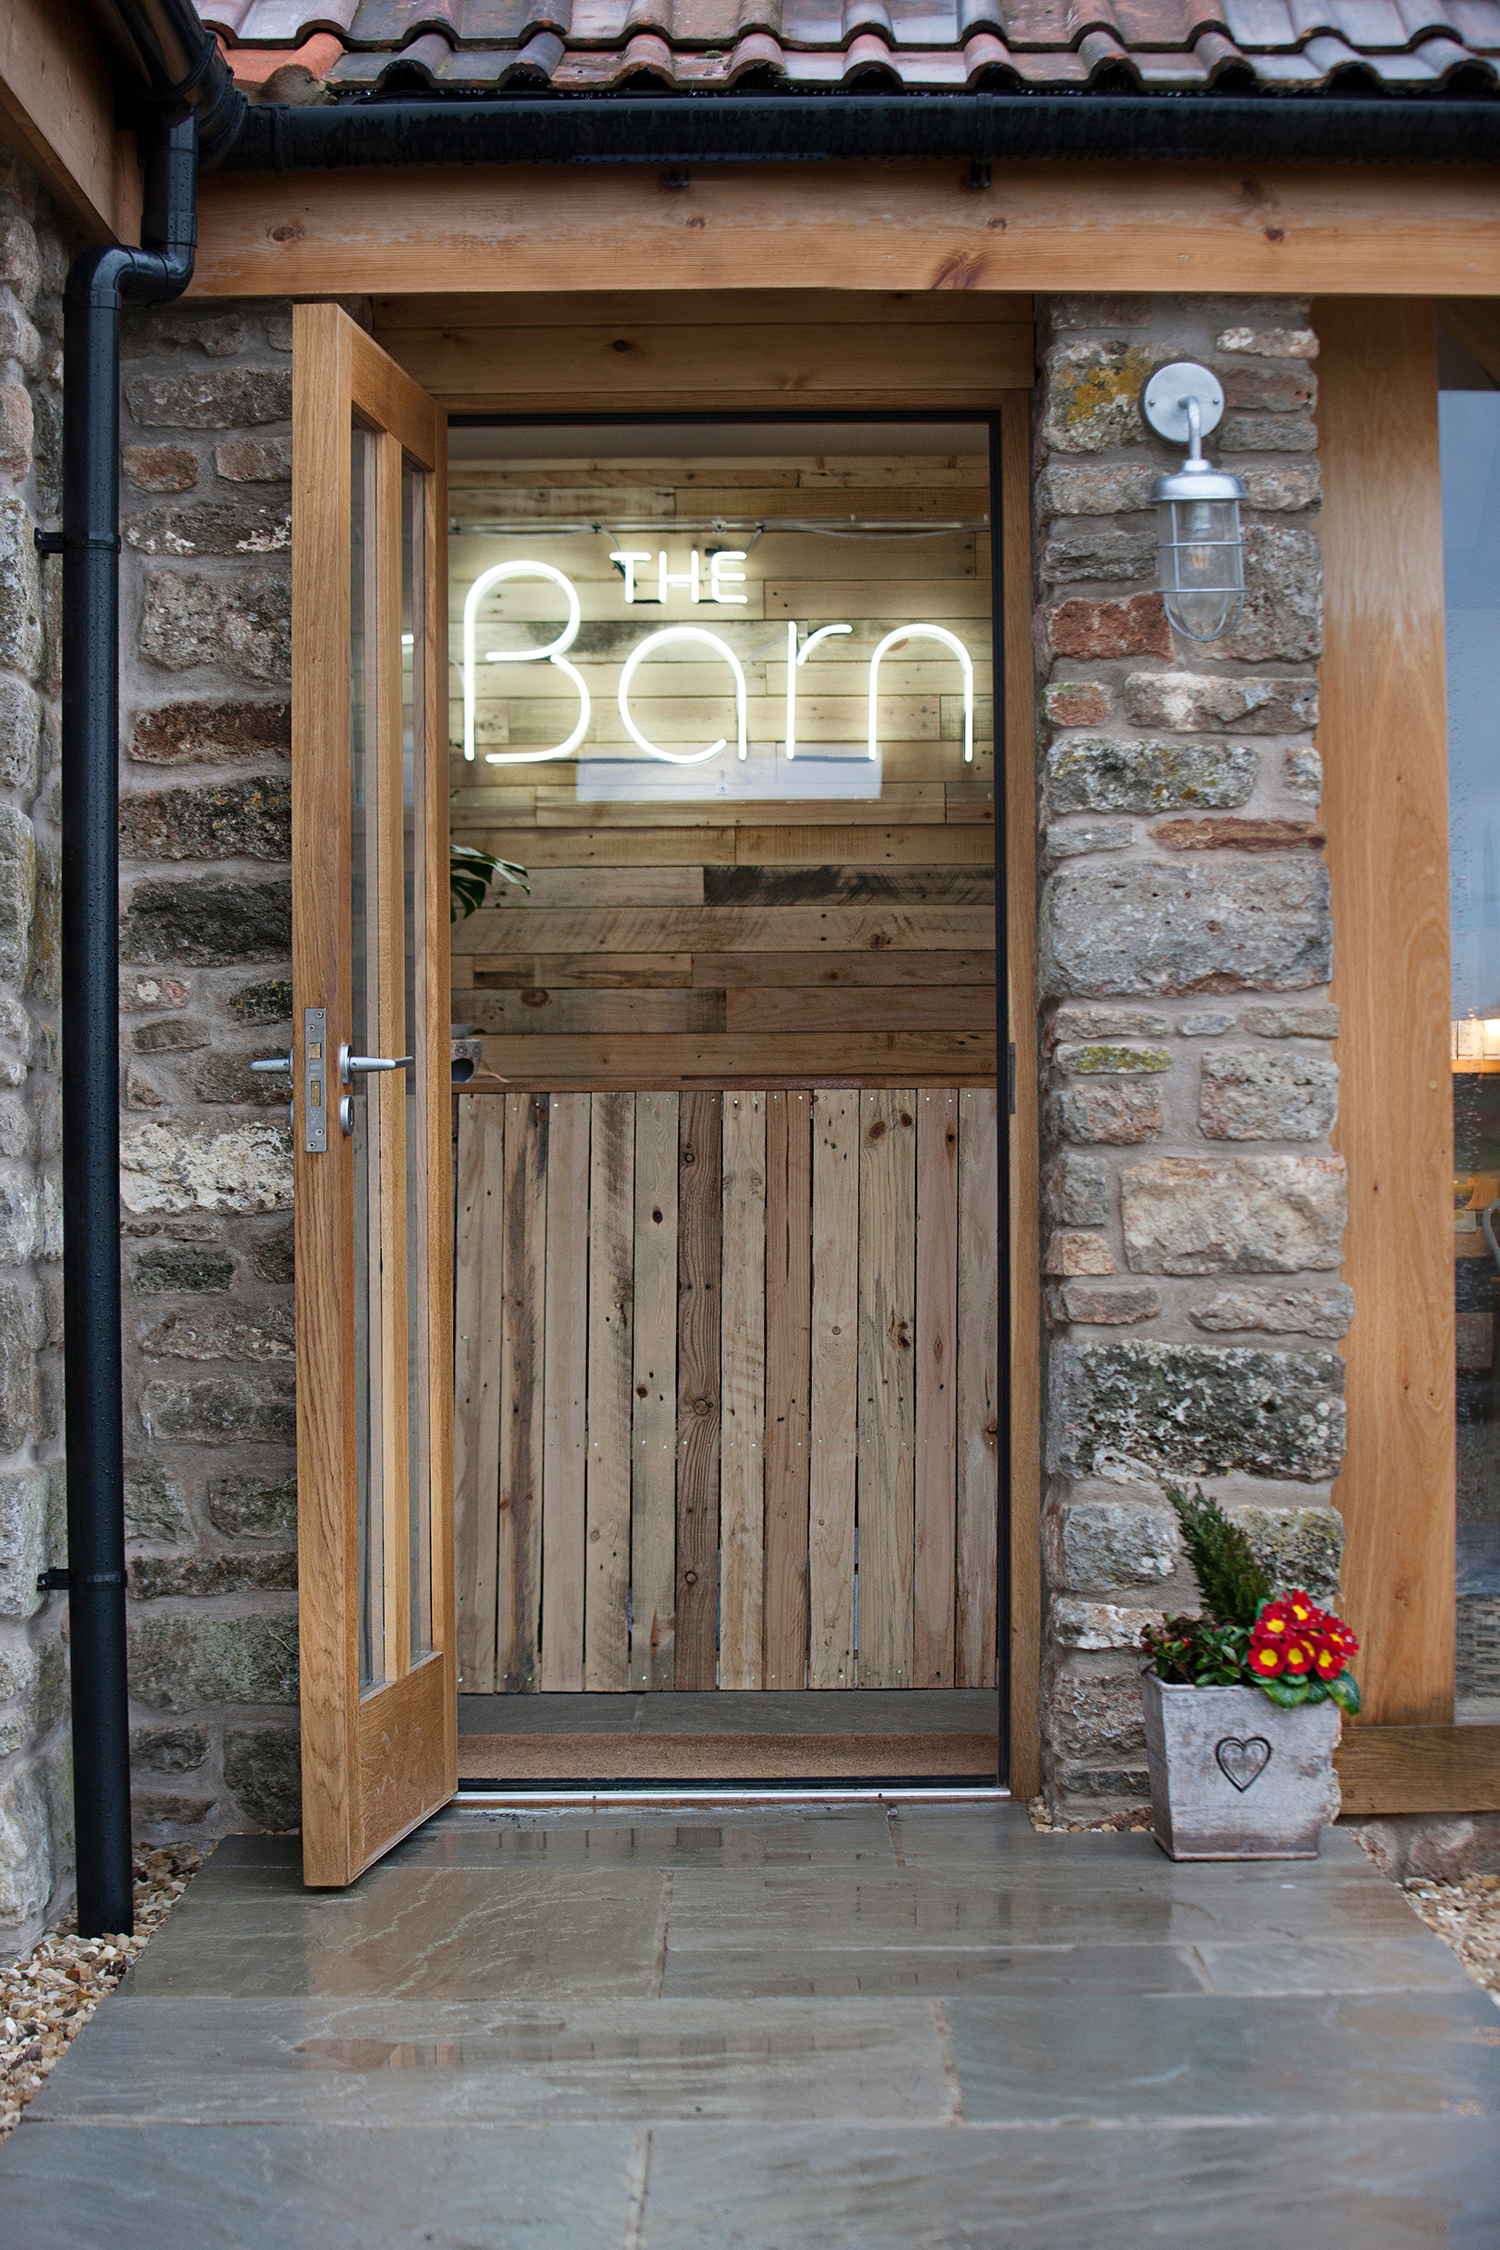 The Barn Neon_LR.jpg